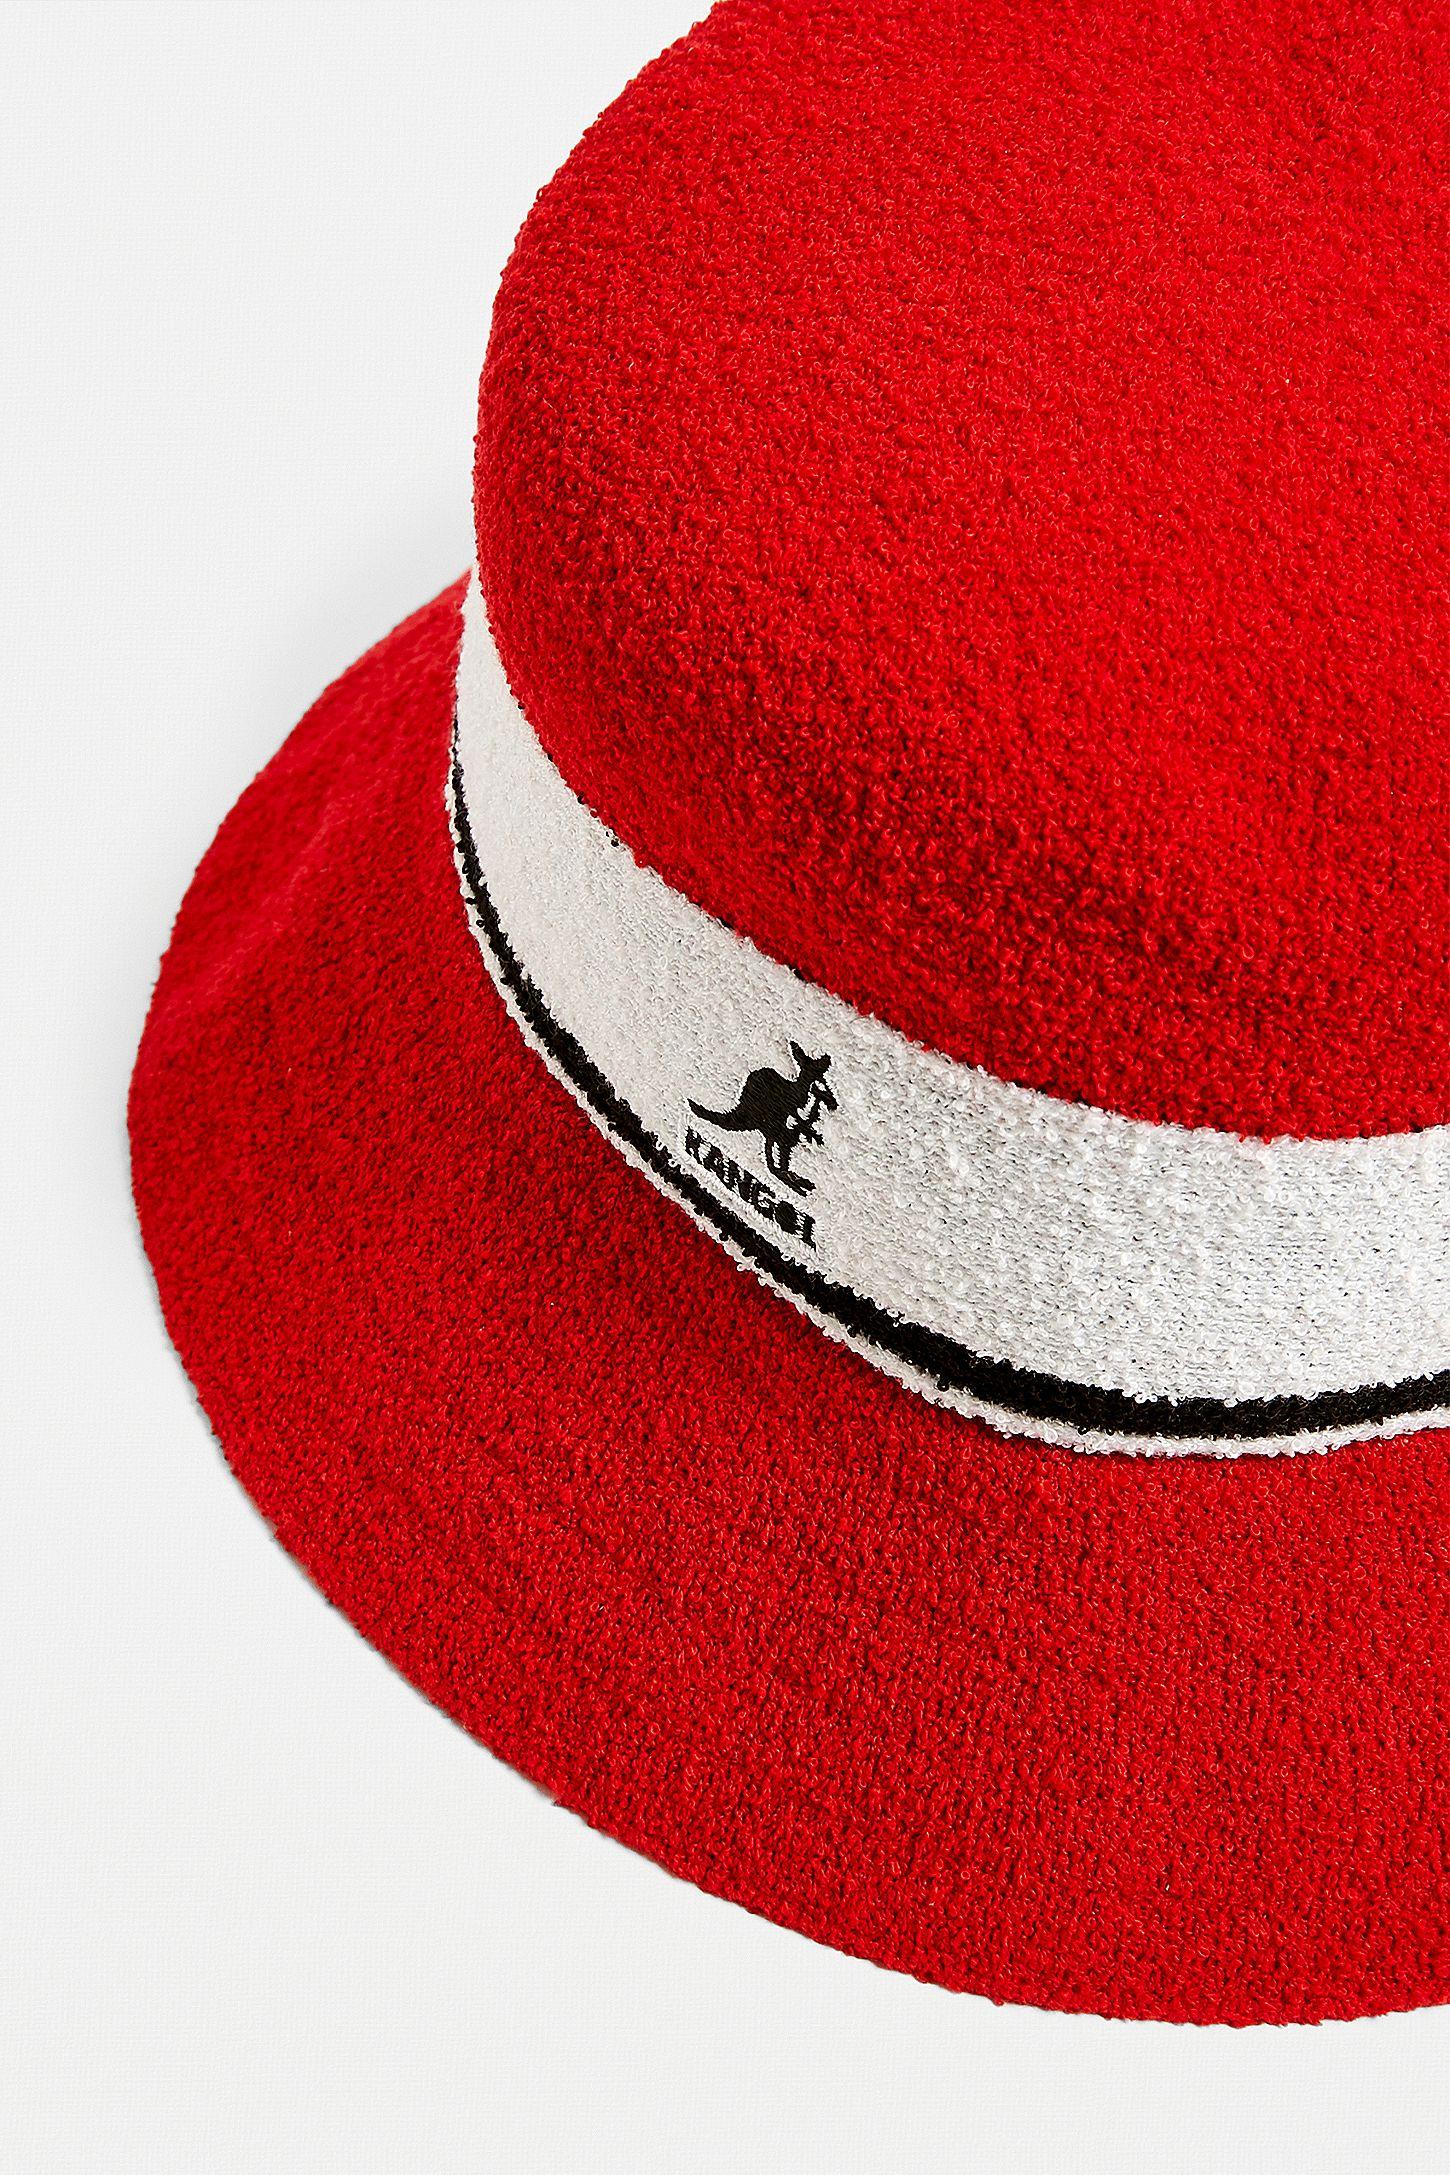 6d097f124321f Slide View  2  Kangol Bermuda Red Stripe Bucket Hat